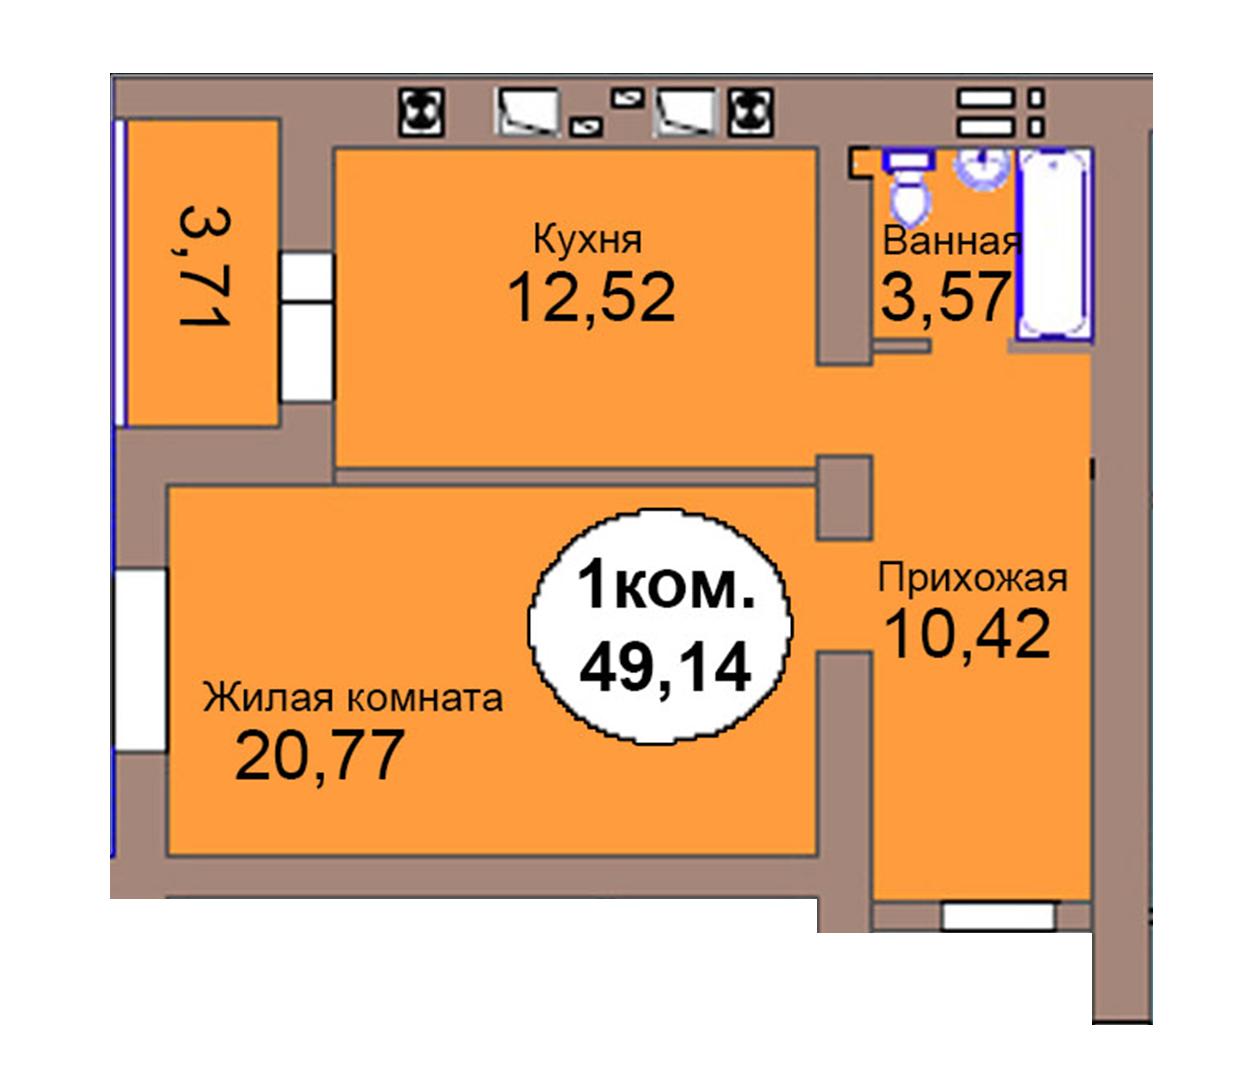 1-комн. кв. по пер. Калининградский, 4  кв. 137 в Калининграде